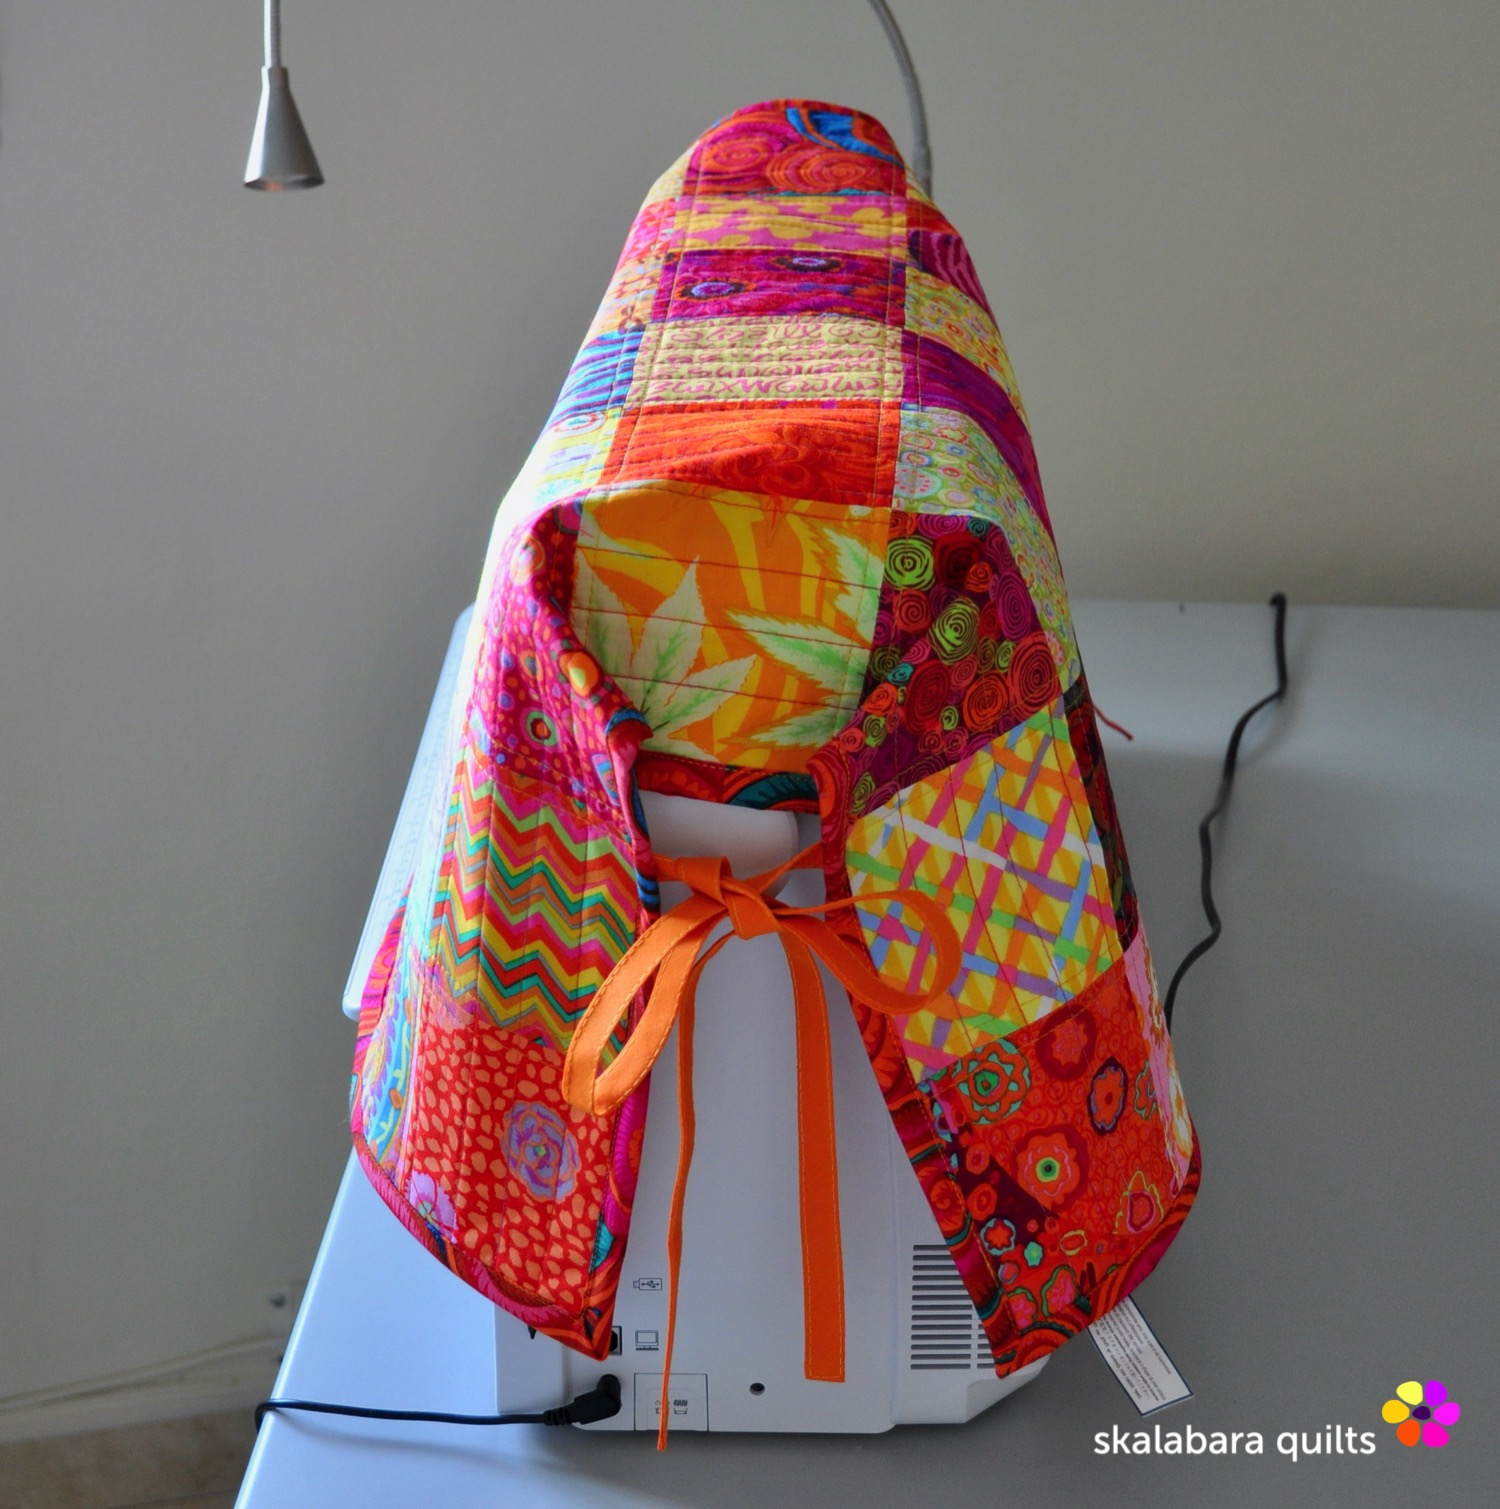 sewing machine cover 3 - skalabara quilts